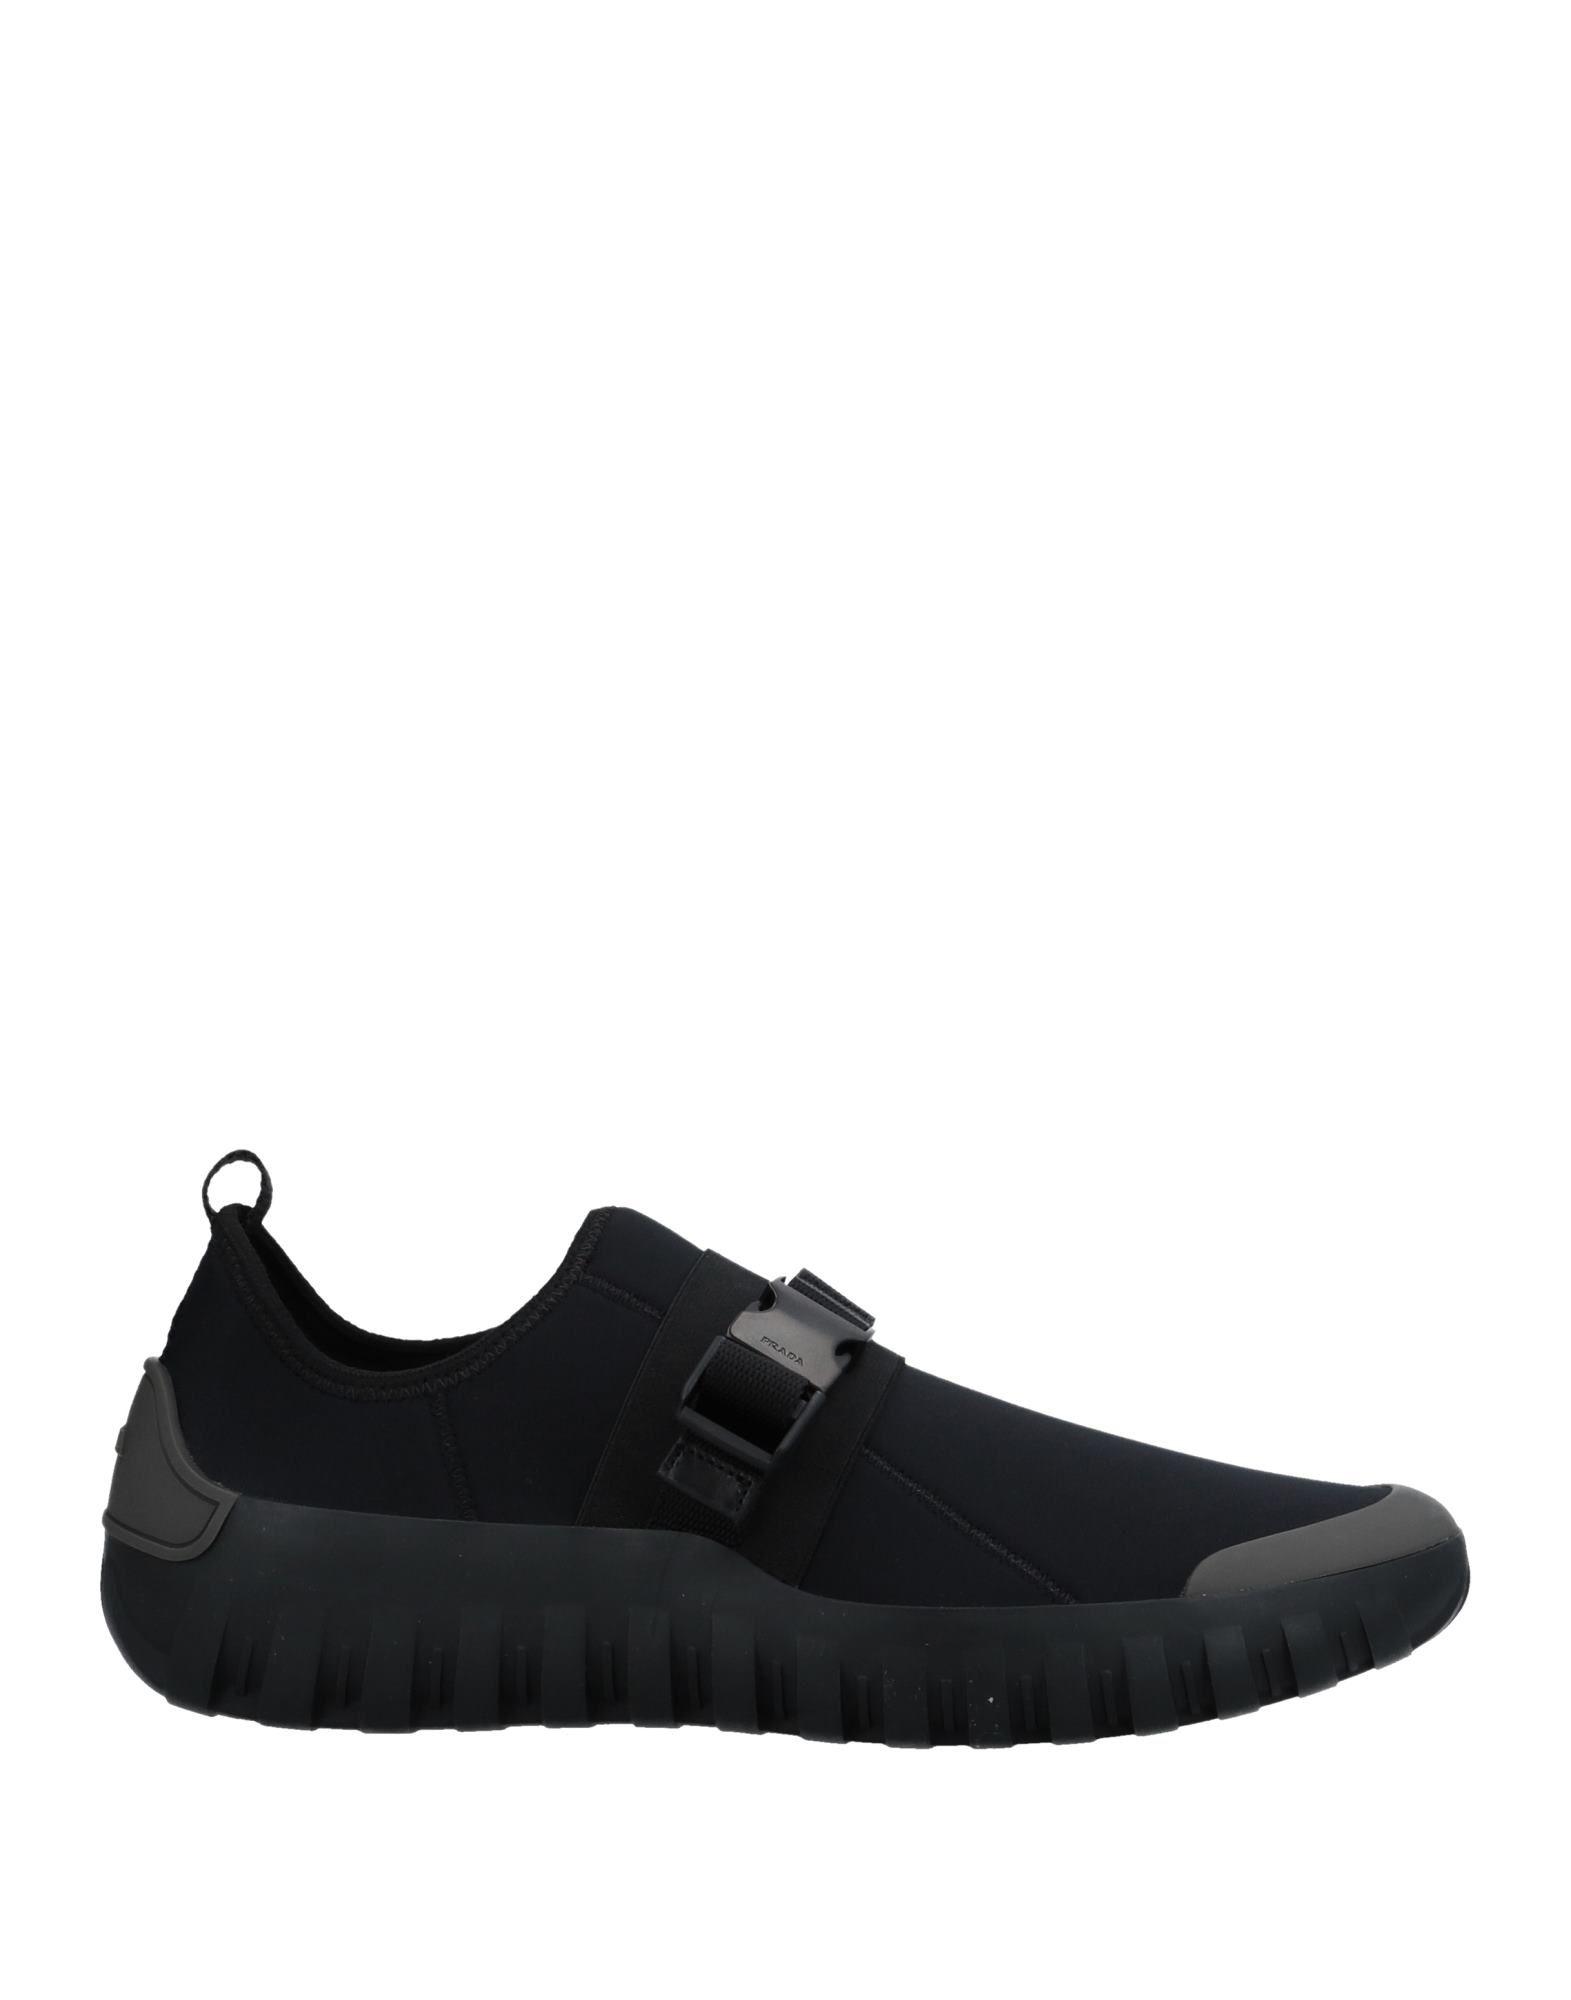 Prada Sport Sneakers Herren  11510483BG Gute Qualität beliebte Schuhe